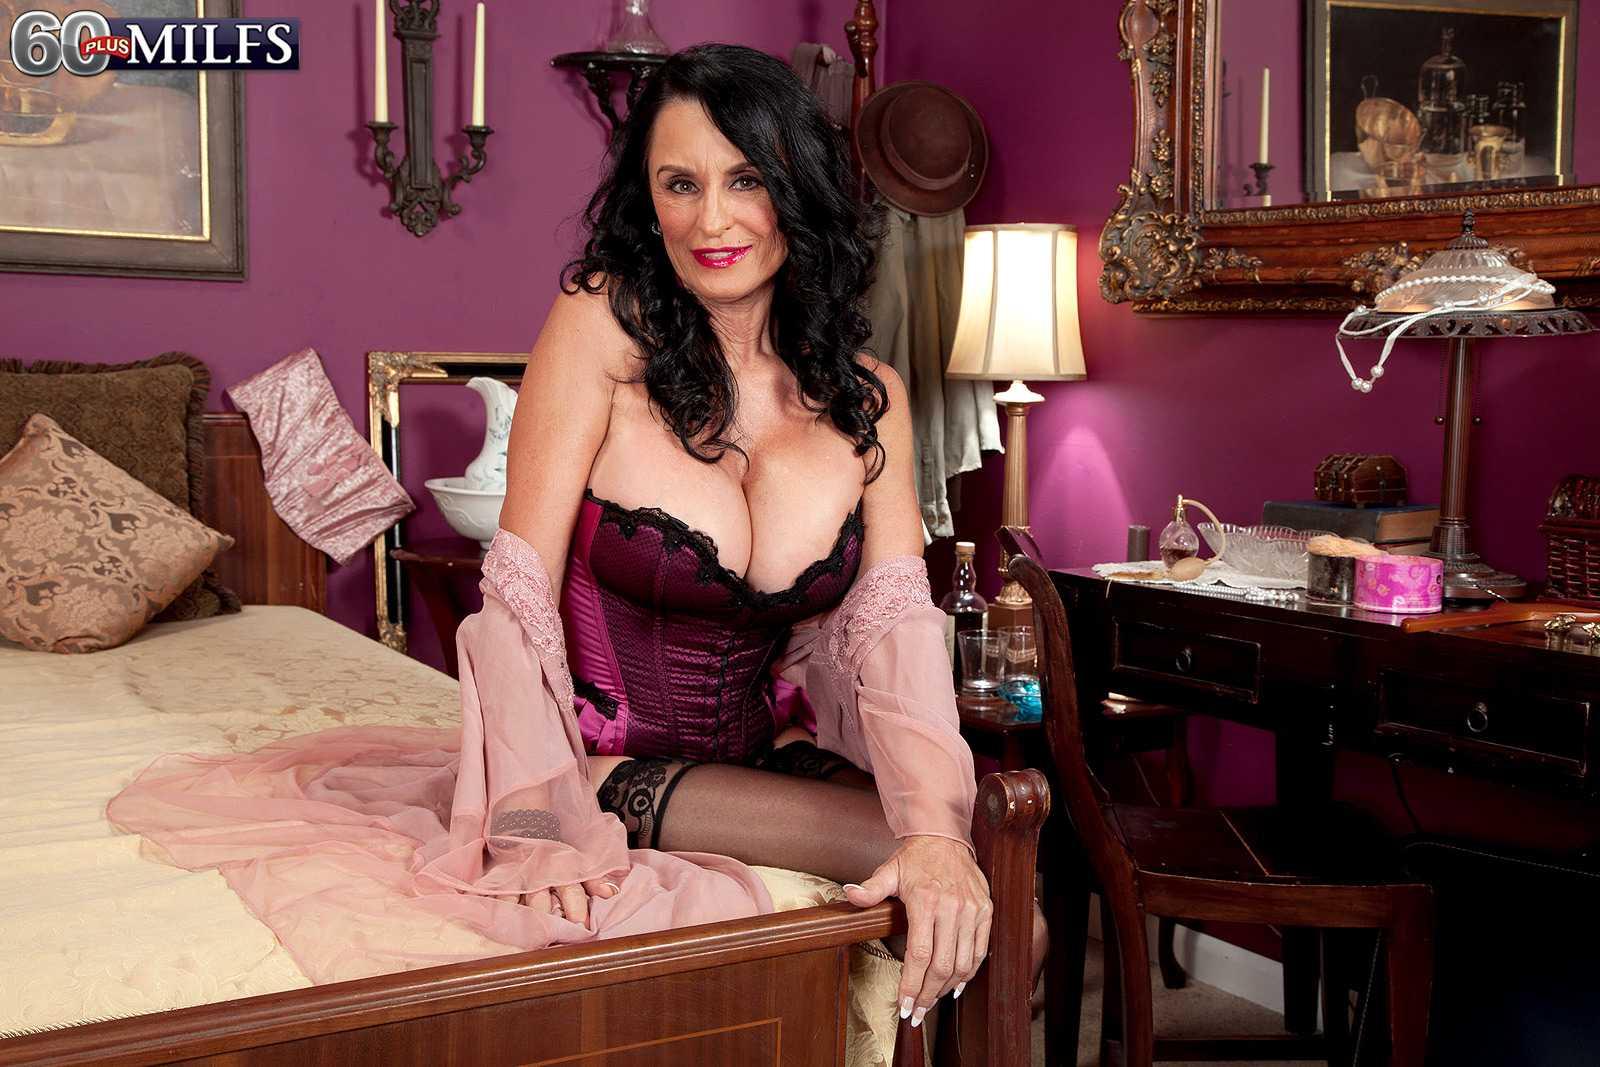 Naughty 60+ Babe Rita Daniels Loves The Phallus